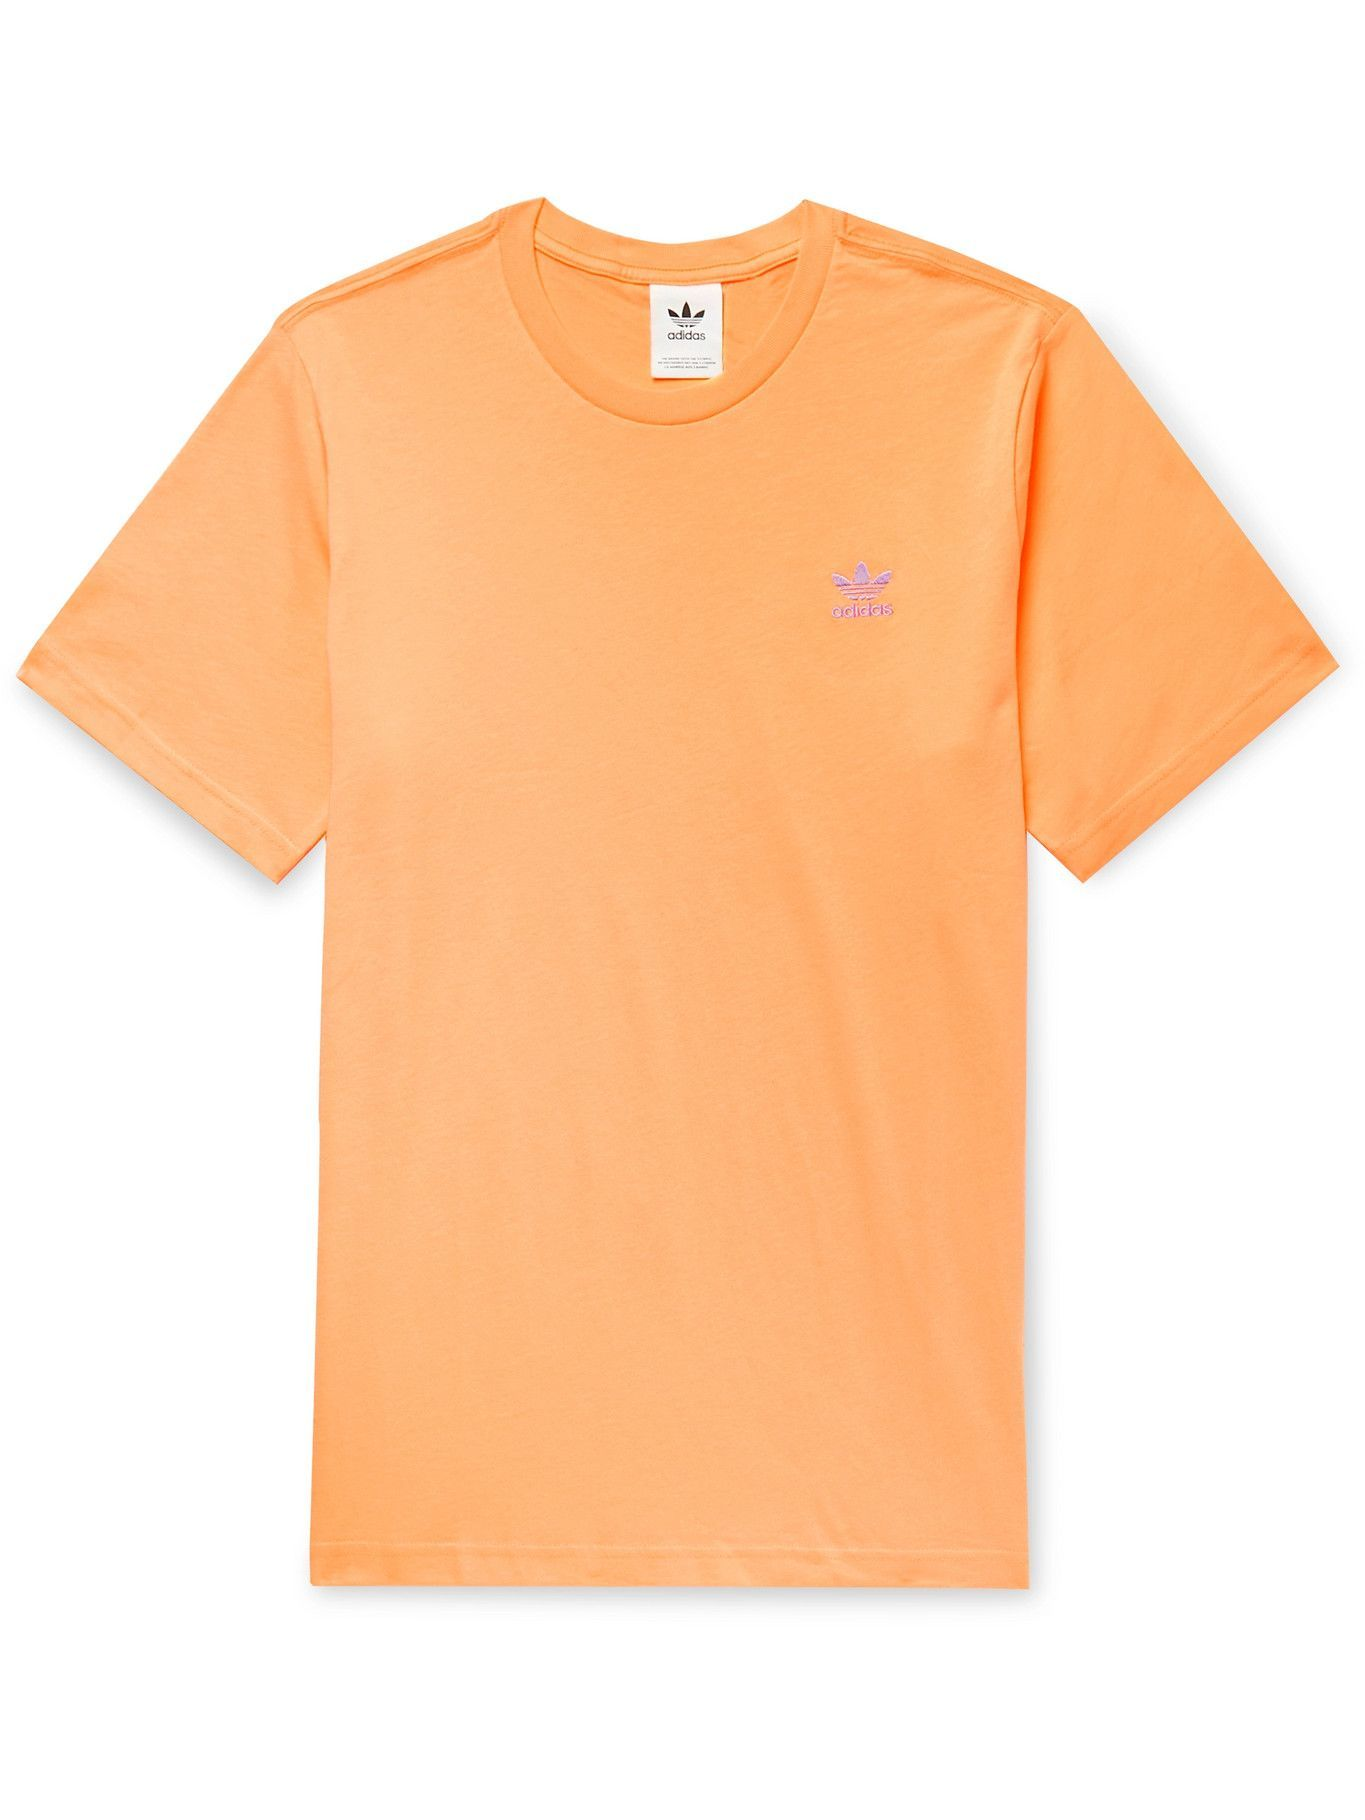 Photo: ADIDAS ORIGINALS - Adicolor Essentials Logo-Embroidered Cotton-Jersey T-Shirt - Orange